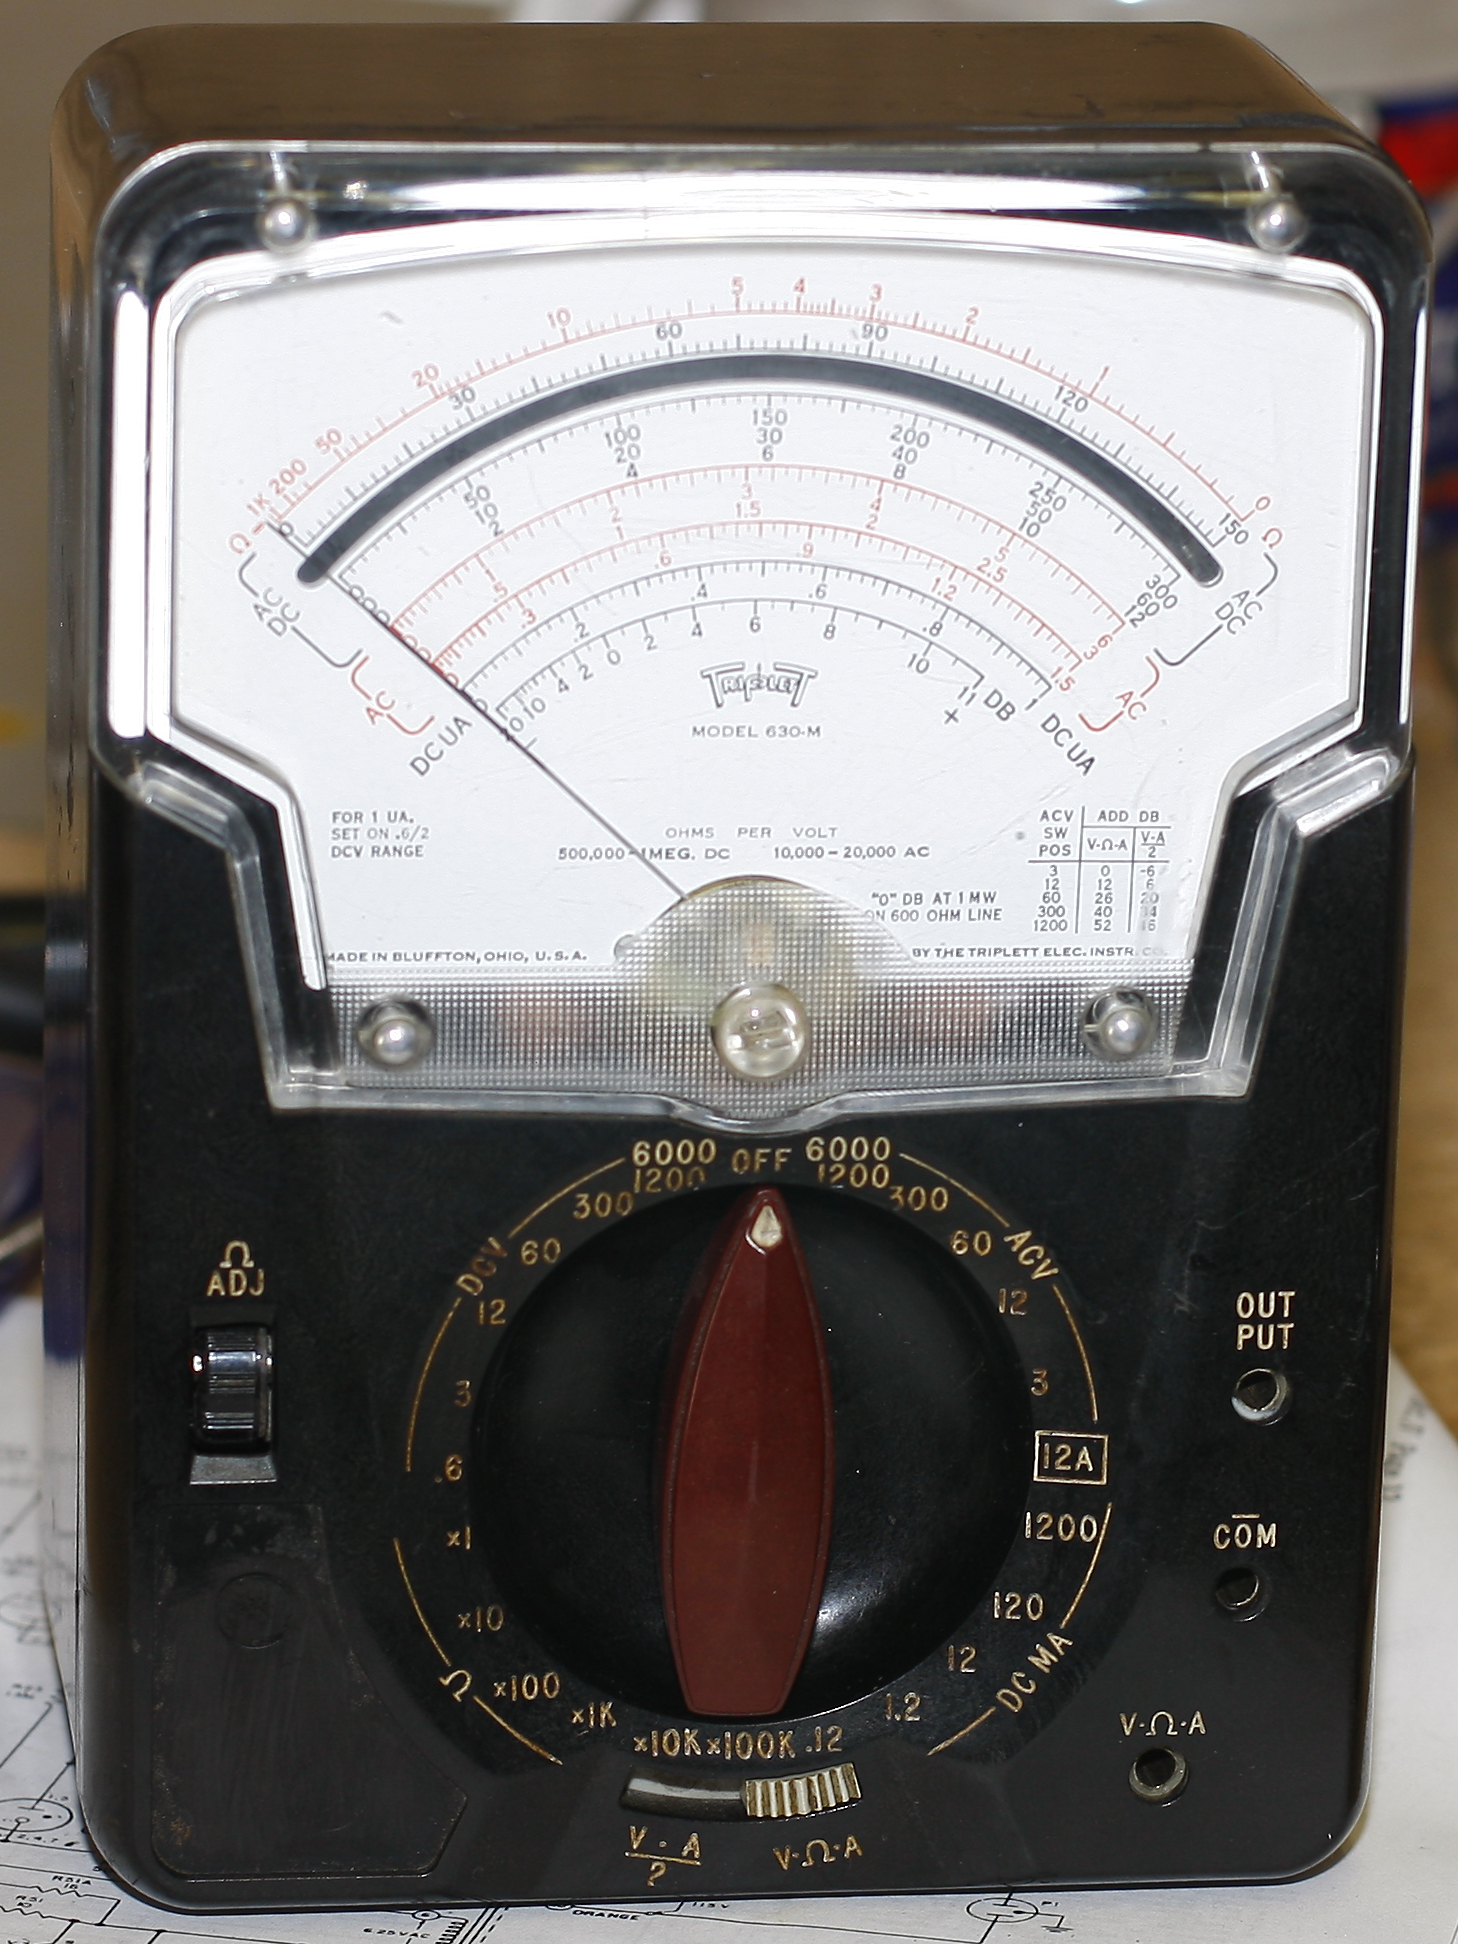 Triplett Analog Multimeter : Turn that damn thing off meters